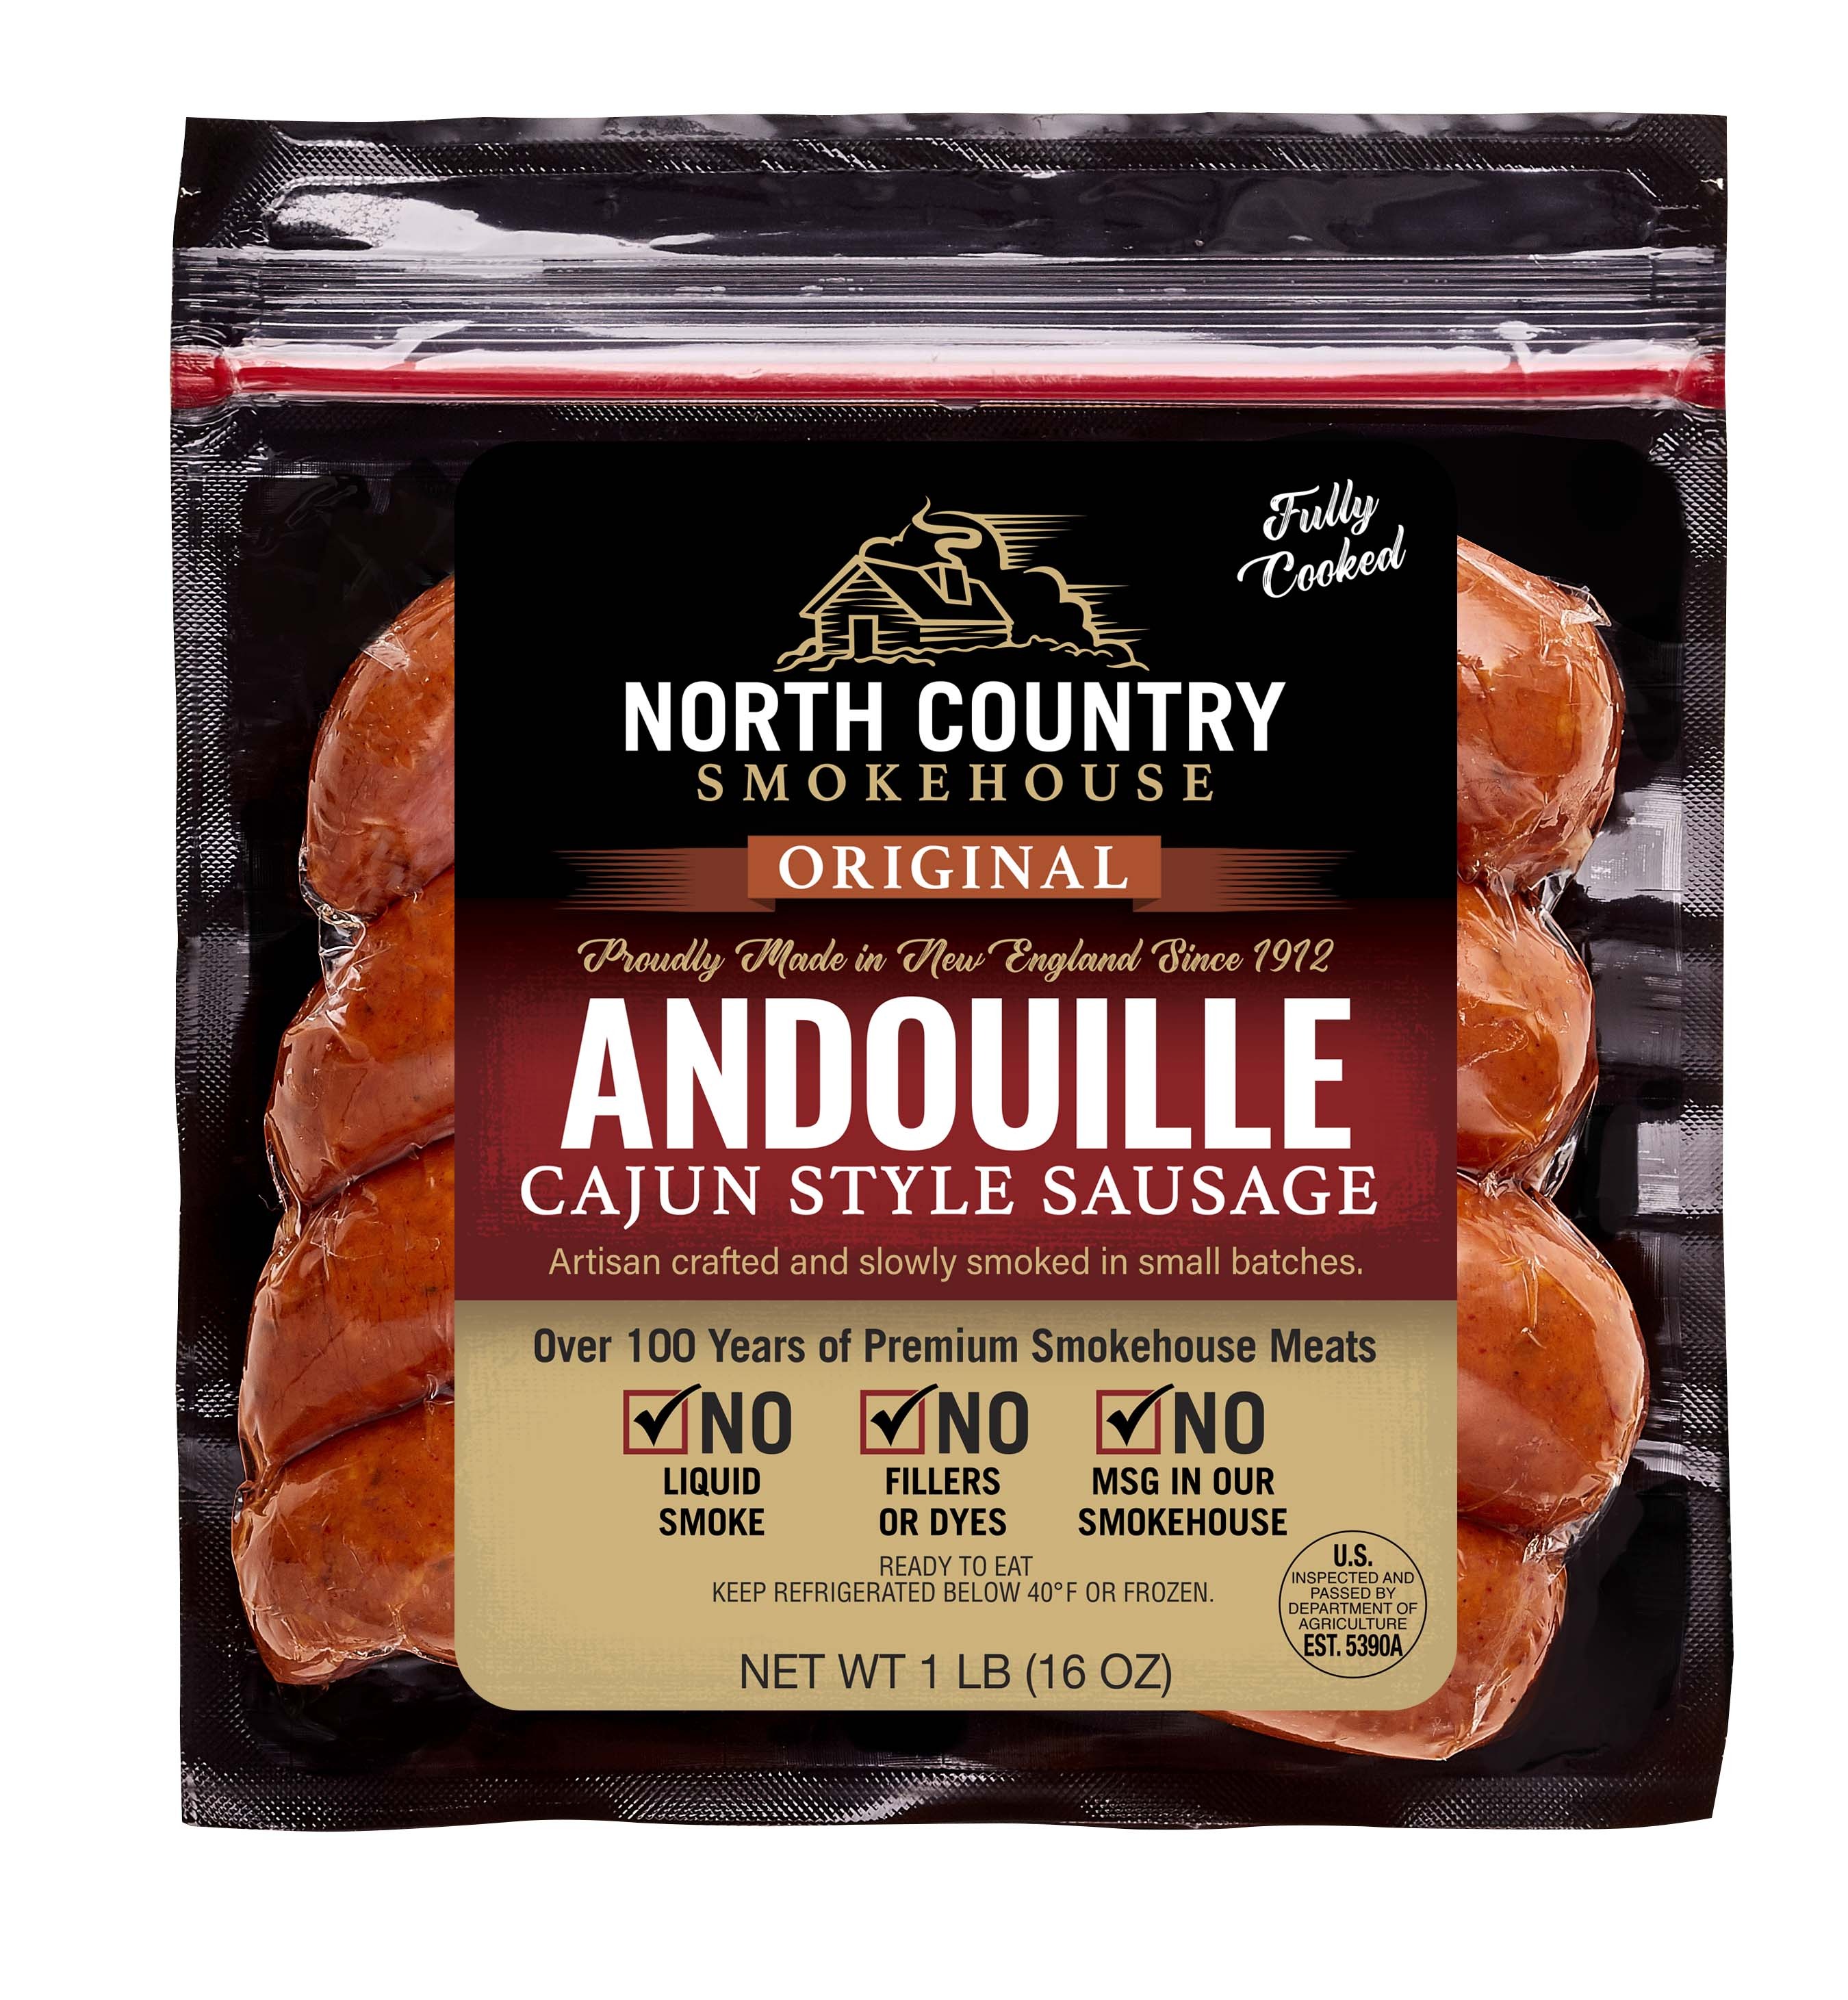 Original Andouille Cajun Style Sausage- 3, 1 lb. packages